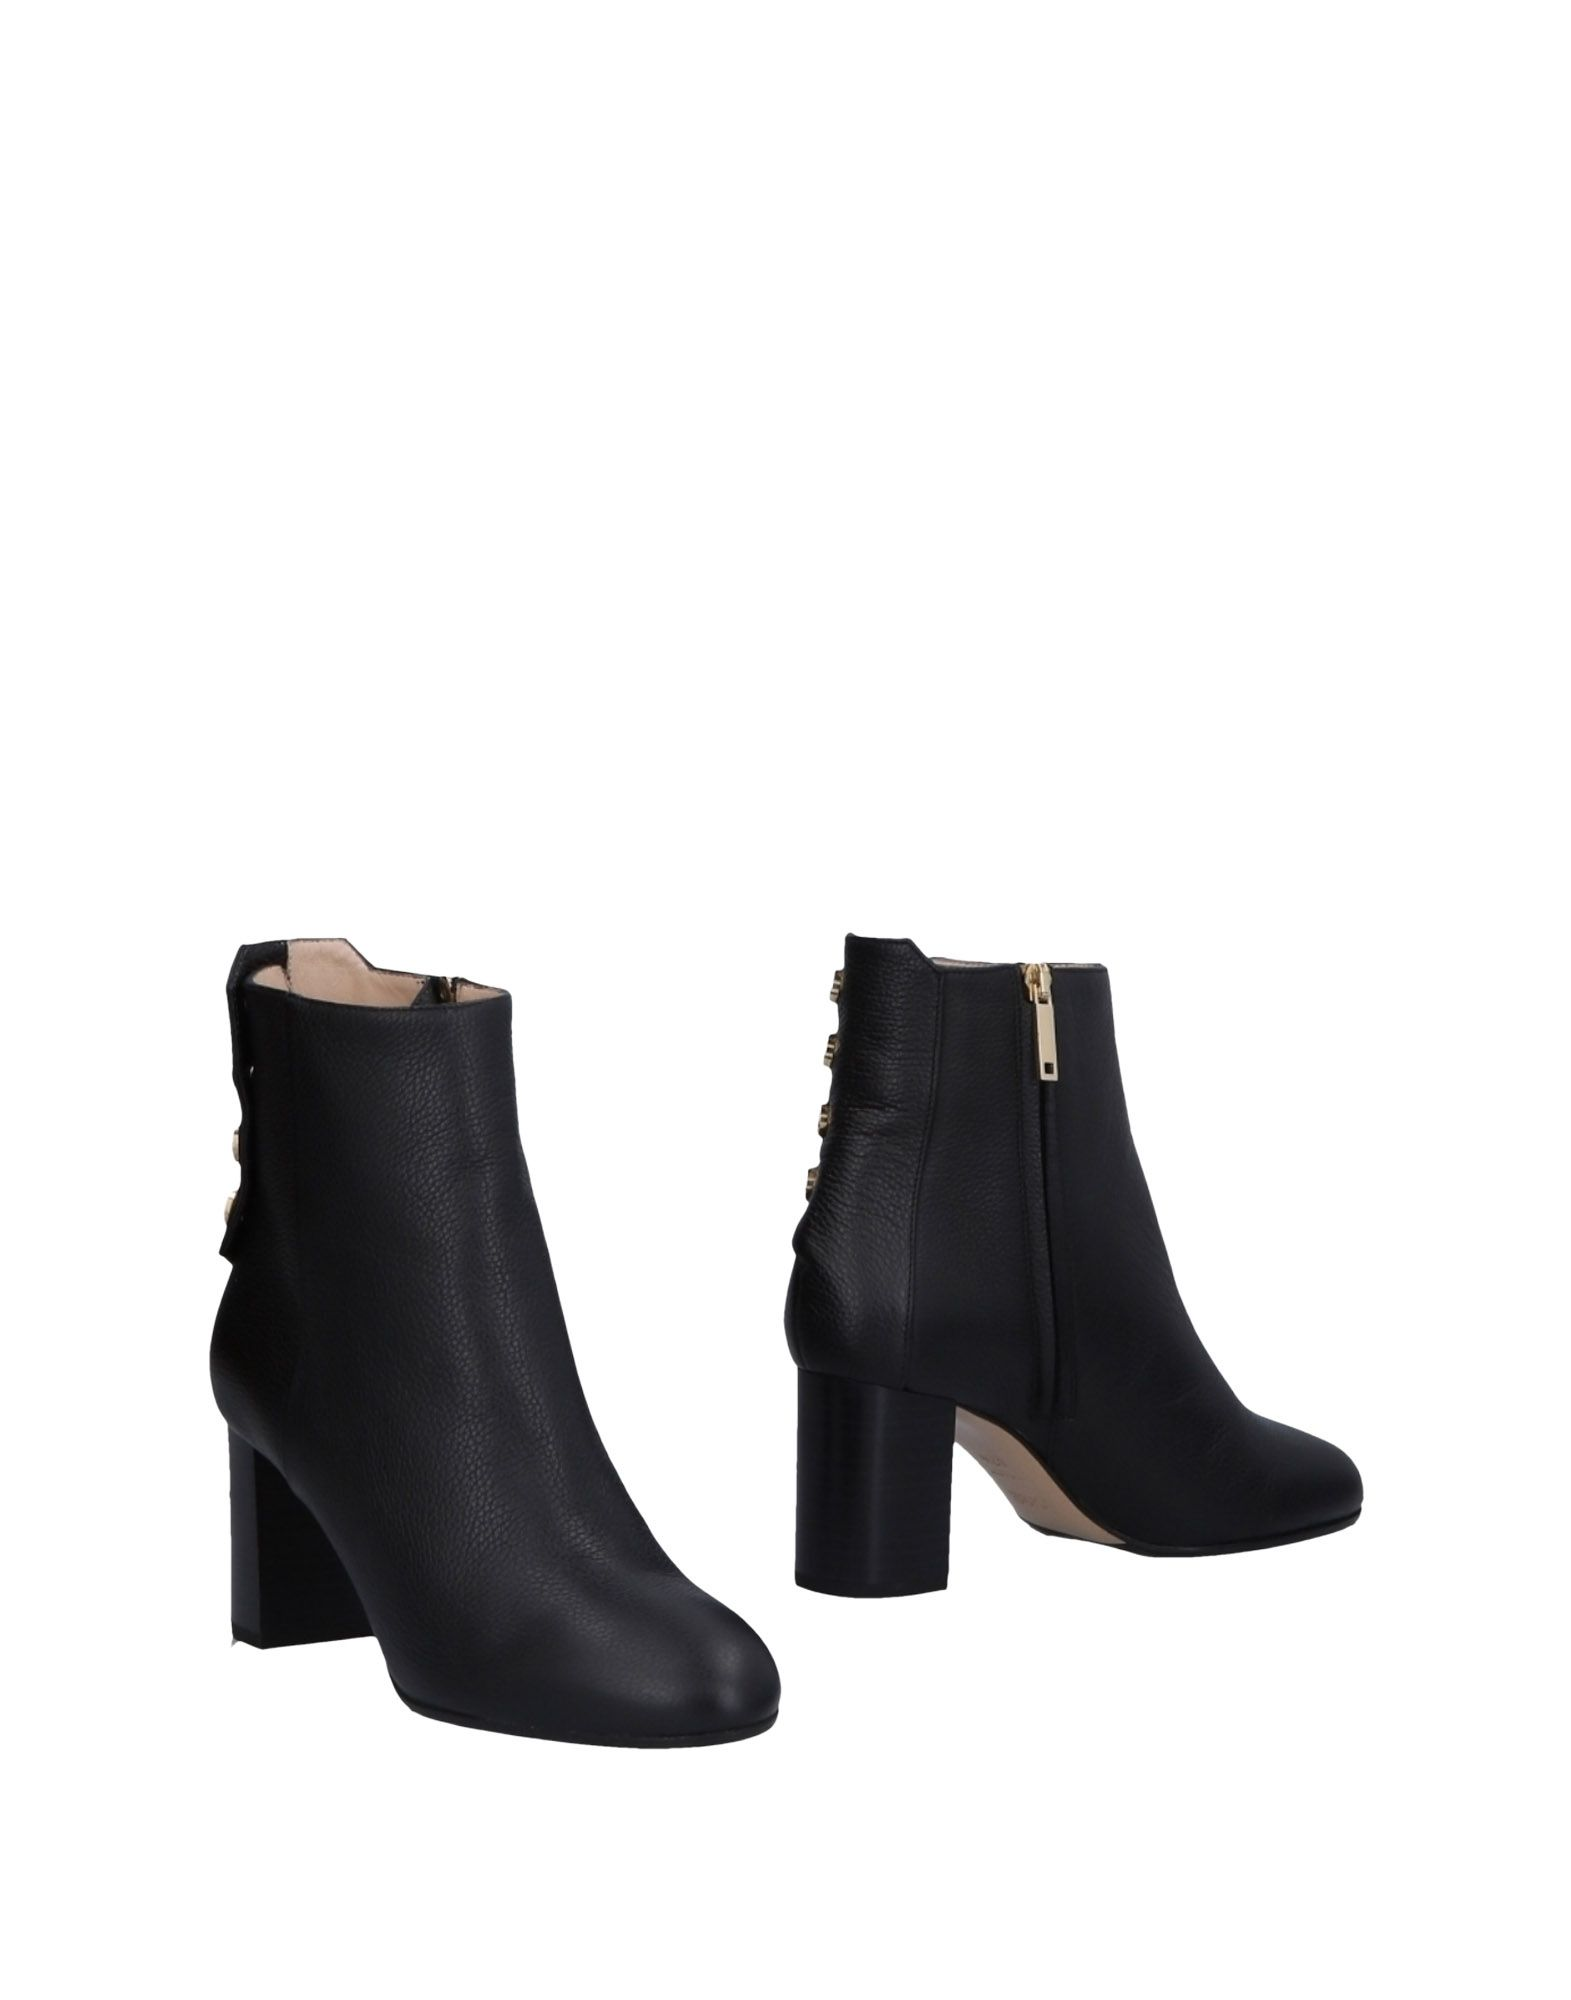 HUGO BOSS Полусапоги и высокие ботинки ботинки hugo boss black ботинки на каблуке